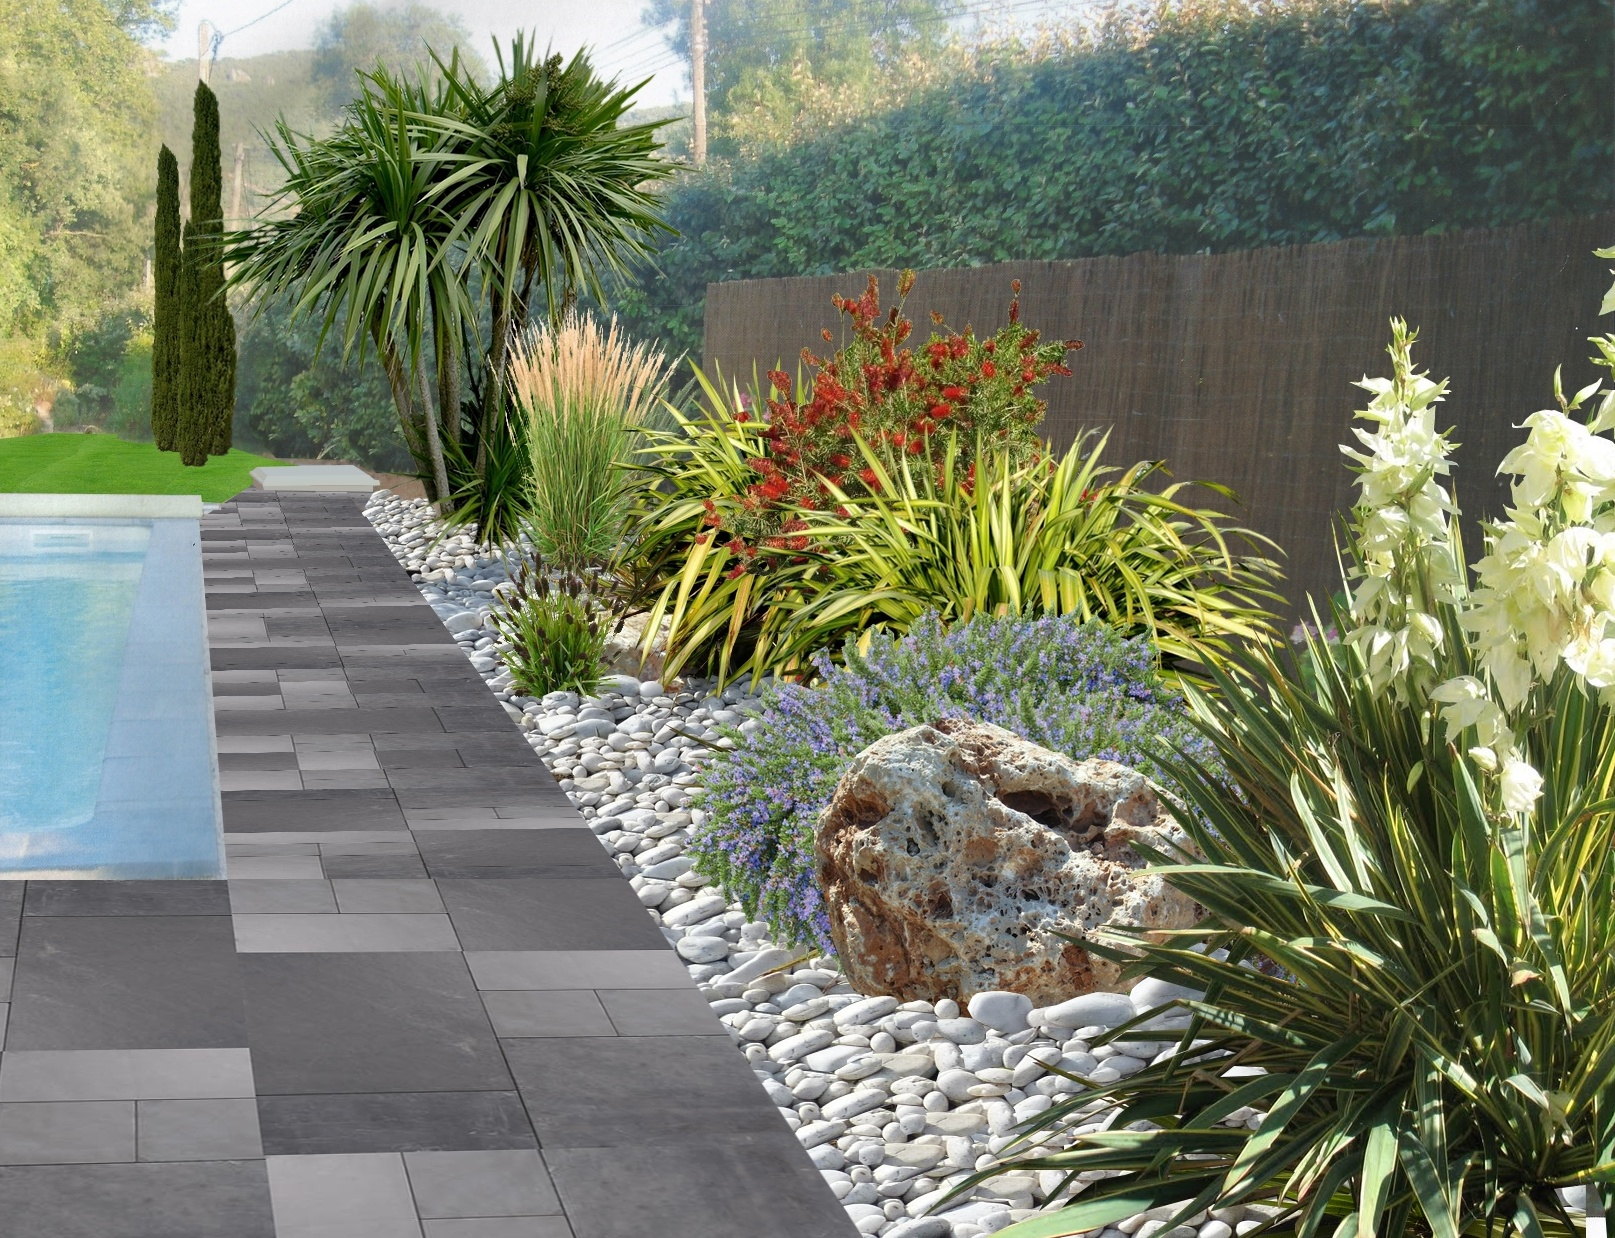 Aménager Un Jardin De Galets concernant Galet Decoration Jardin